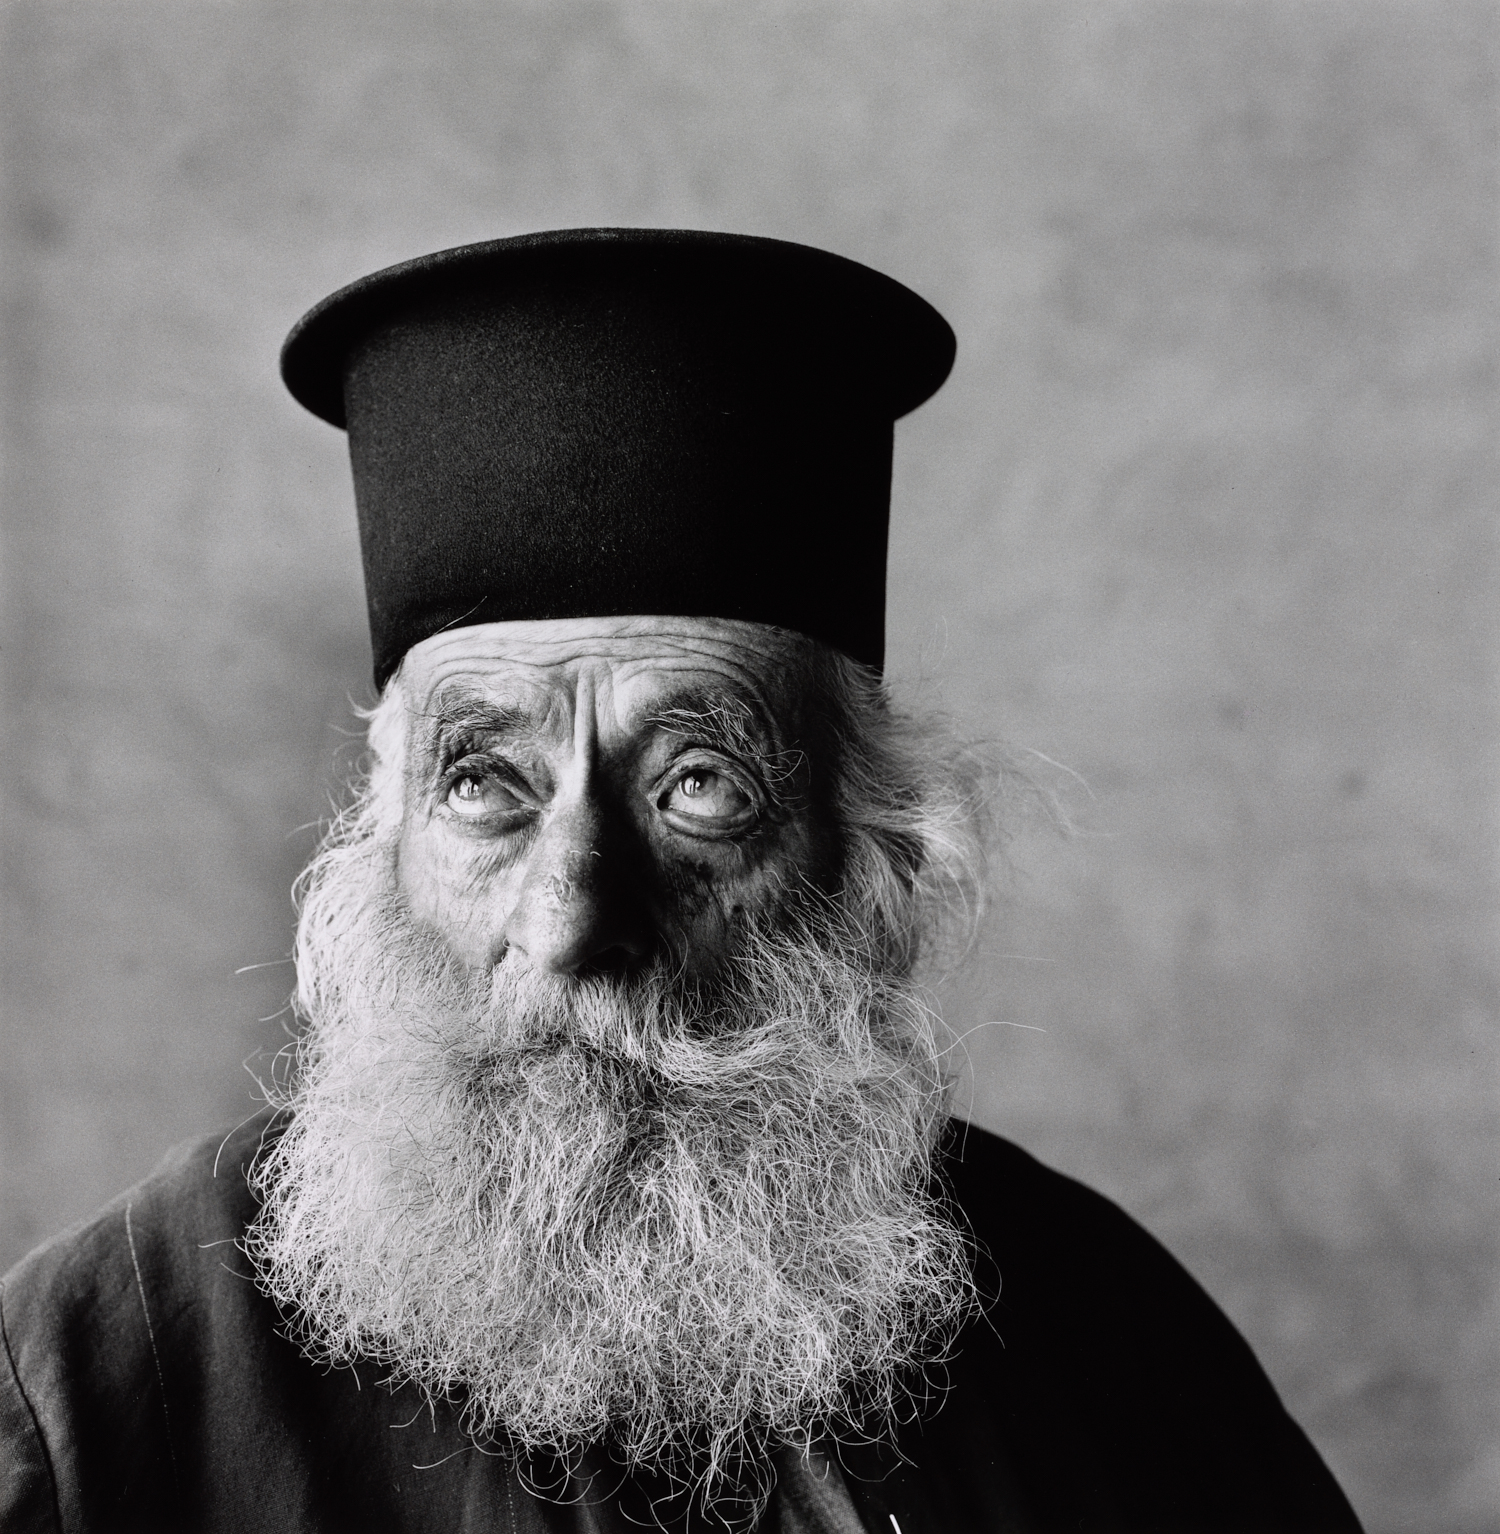 Cretan Priest, 1964 Gelatin silver print © Condé Nast / The Irving Penn Foundation